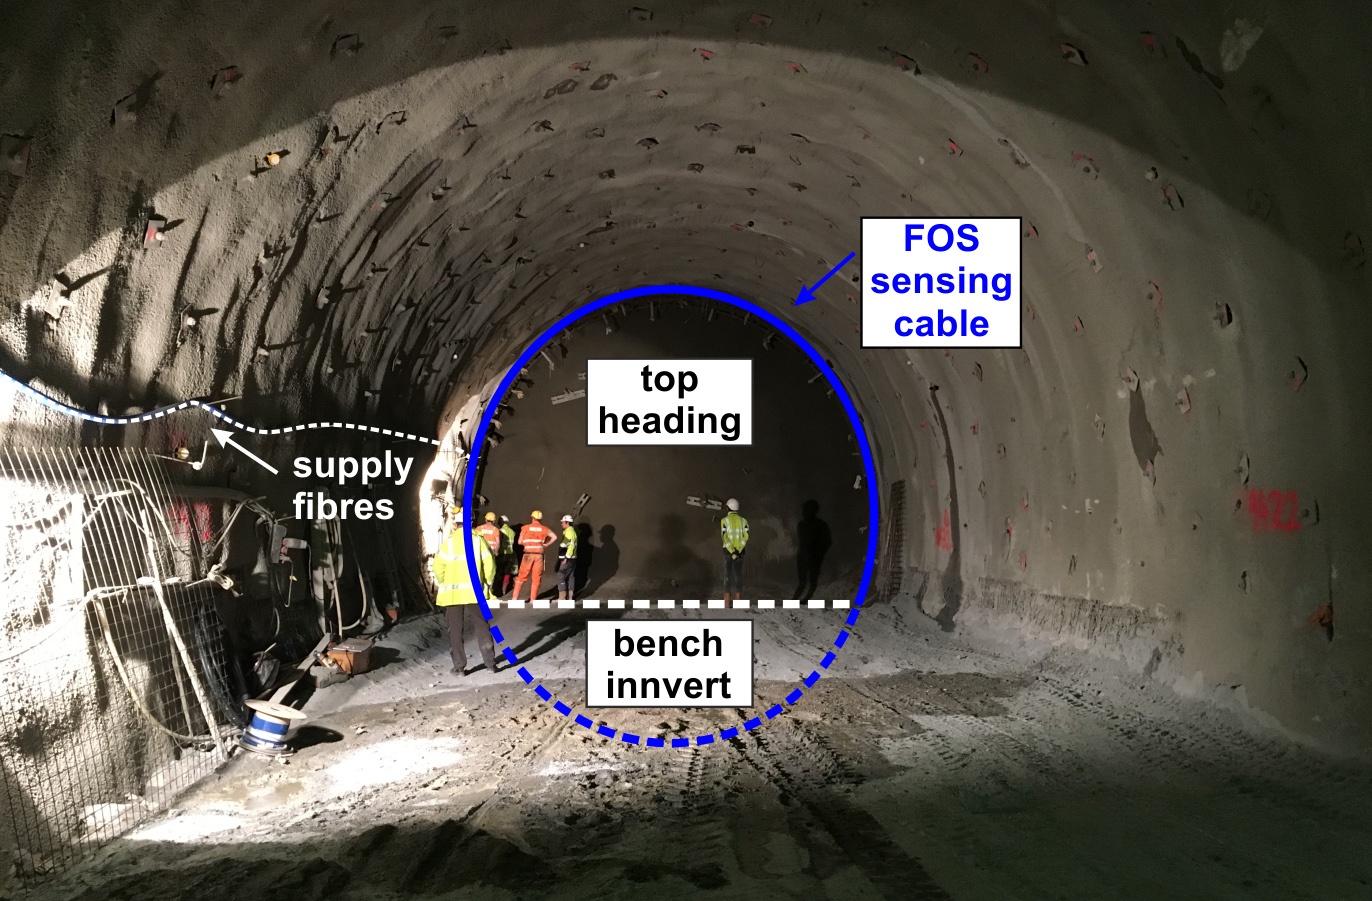 IGMS - Distributed Fiber Optic Sensing in Tunneling